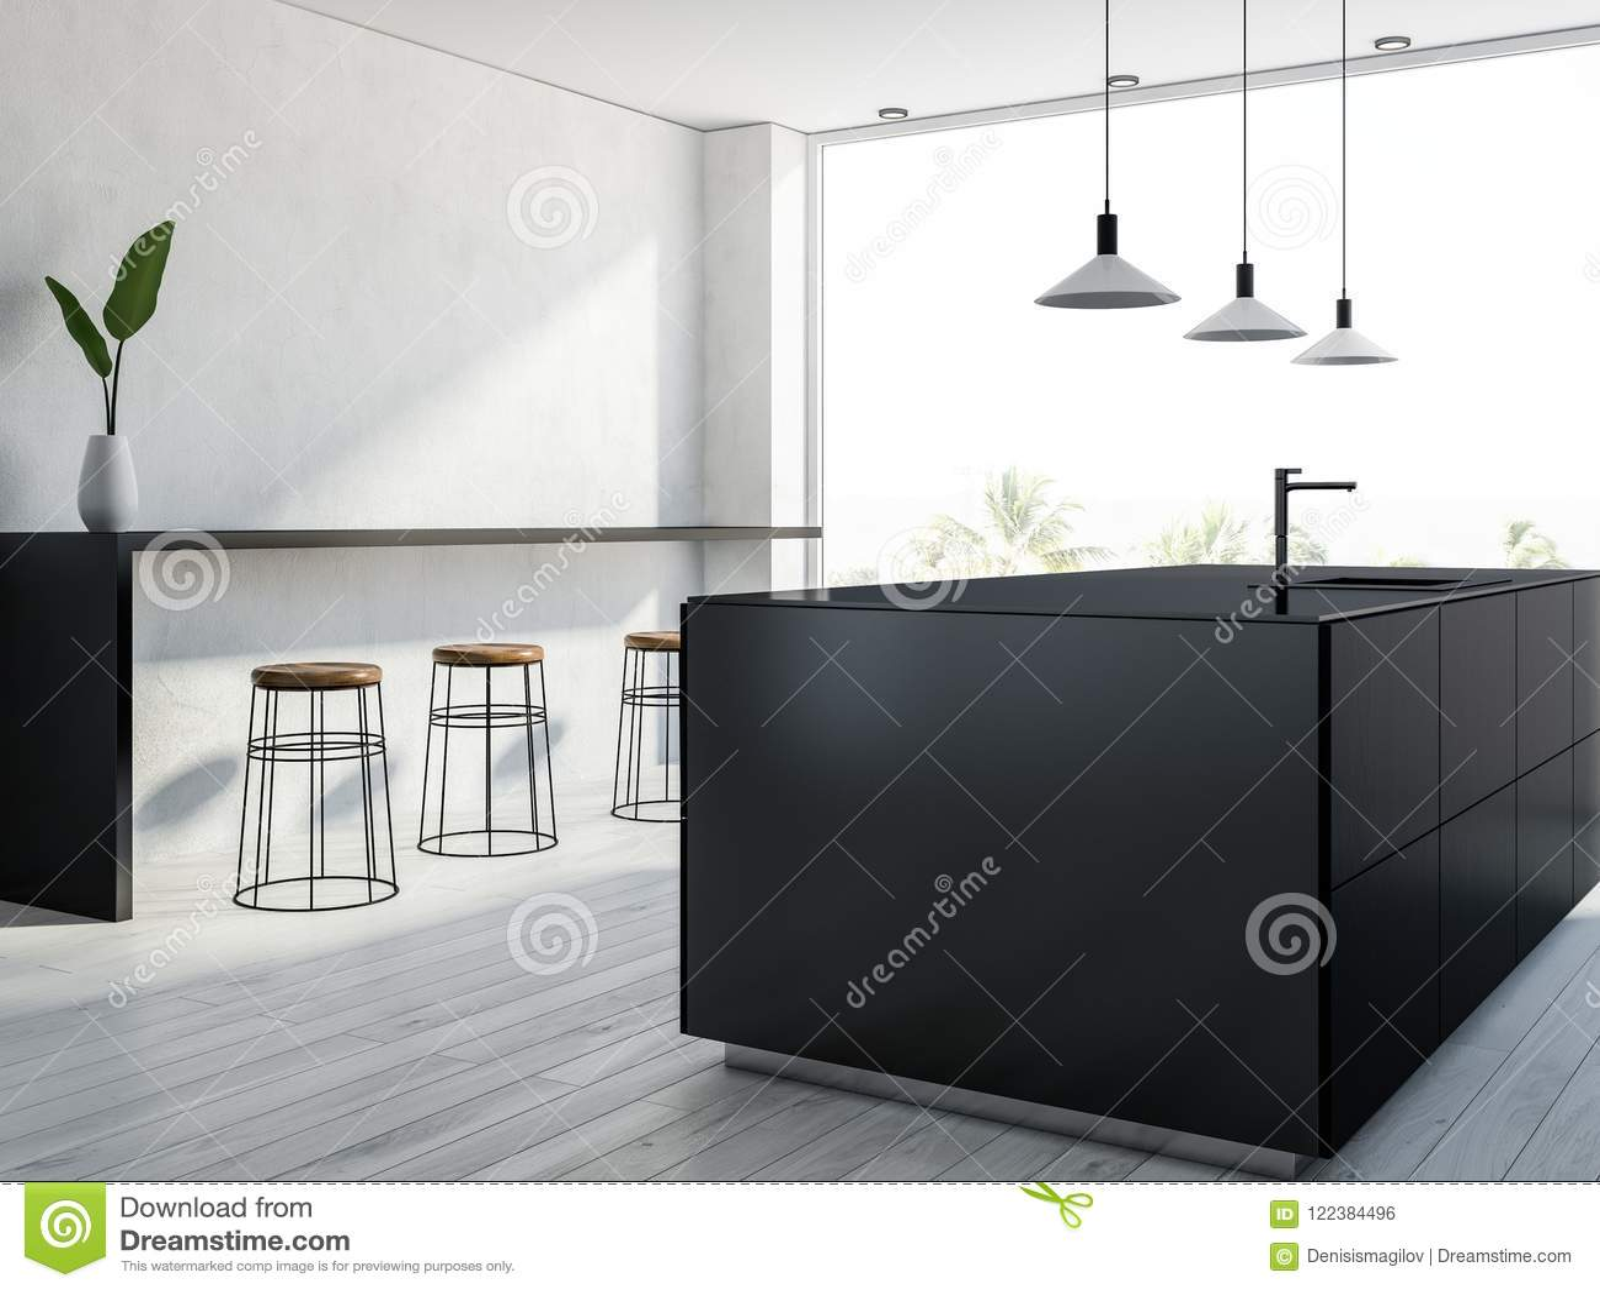 kitchen bar lights installing backsplash tile sheets 黑白全景厨房conrer 酒吧库存例证 插画包括有房子 烤箱 公寓 复制 与一个白色木地板 黑柜台 一个酒吧与凳子和时髦的天花板灯的全景厨房内部侧视图3d翻译